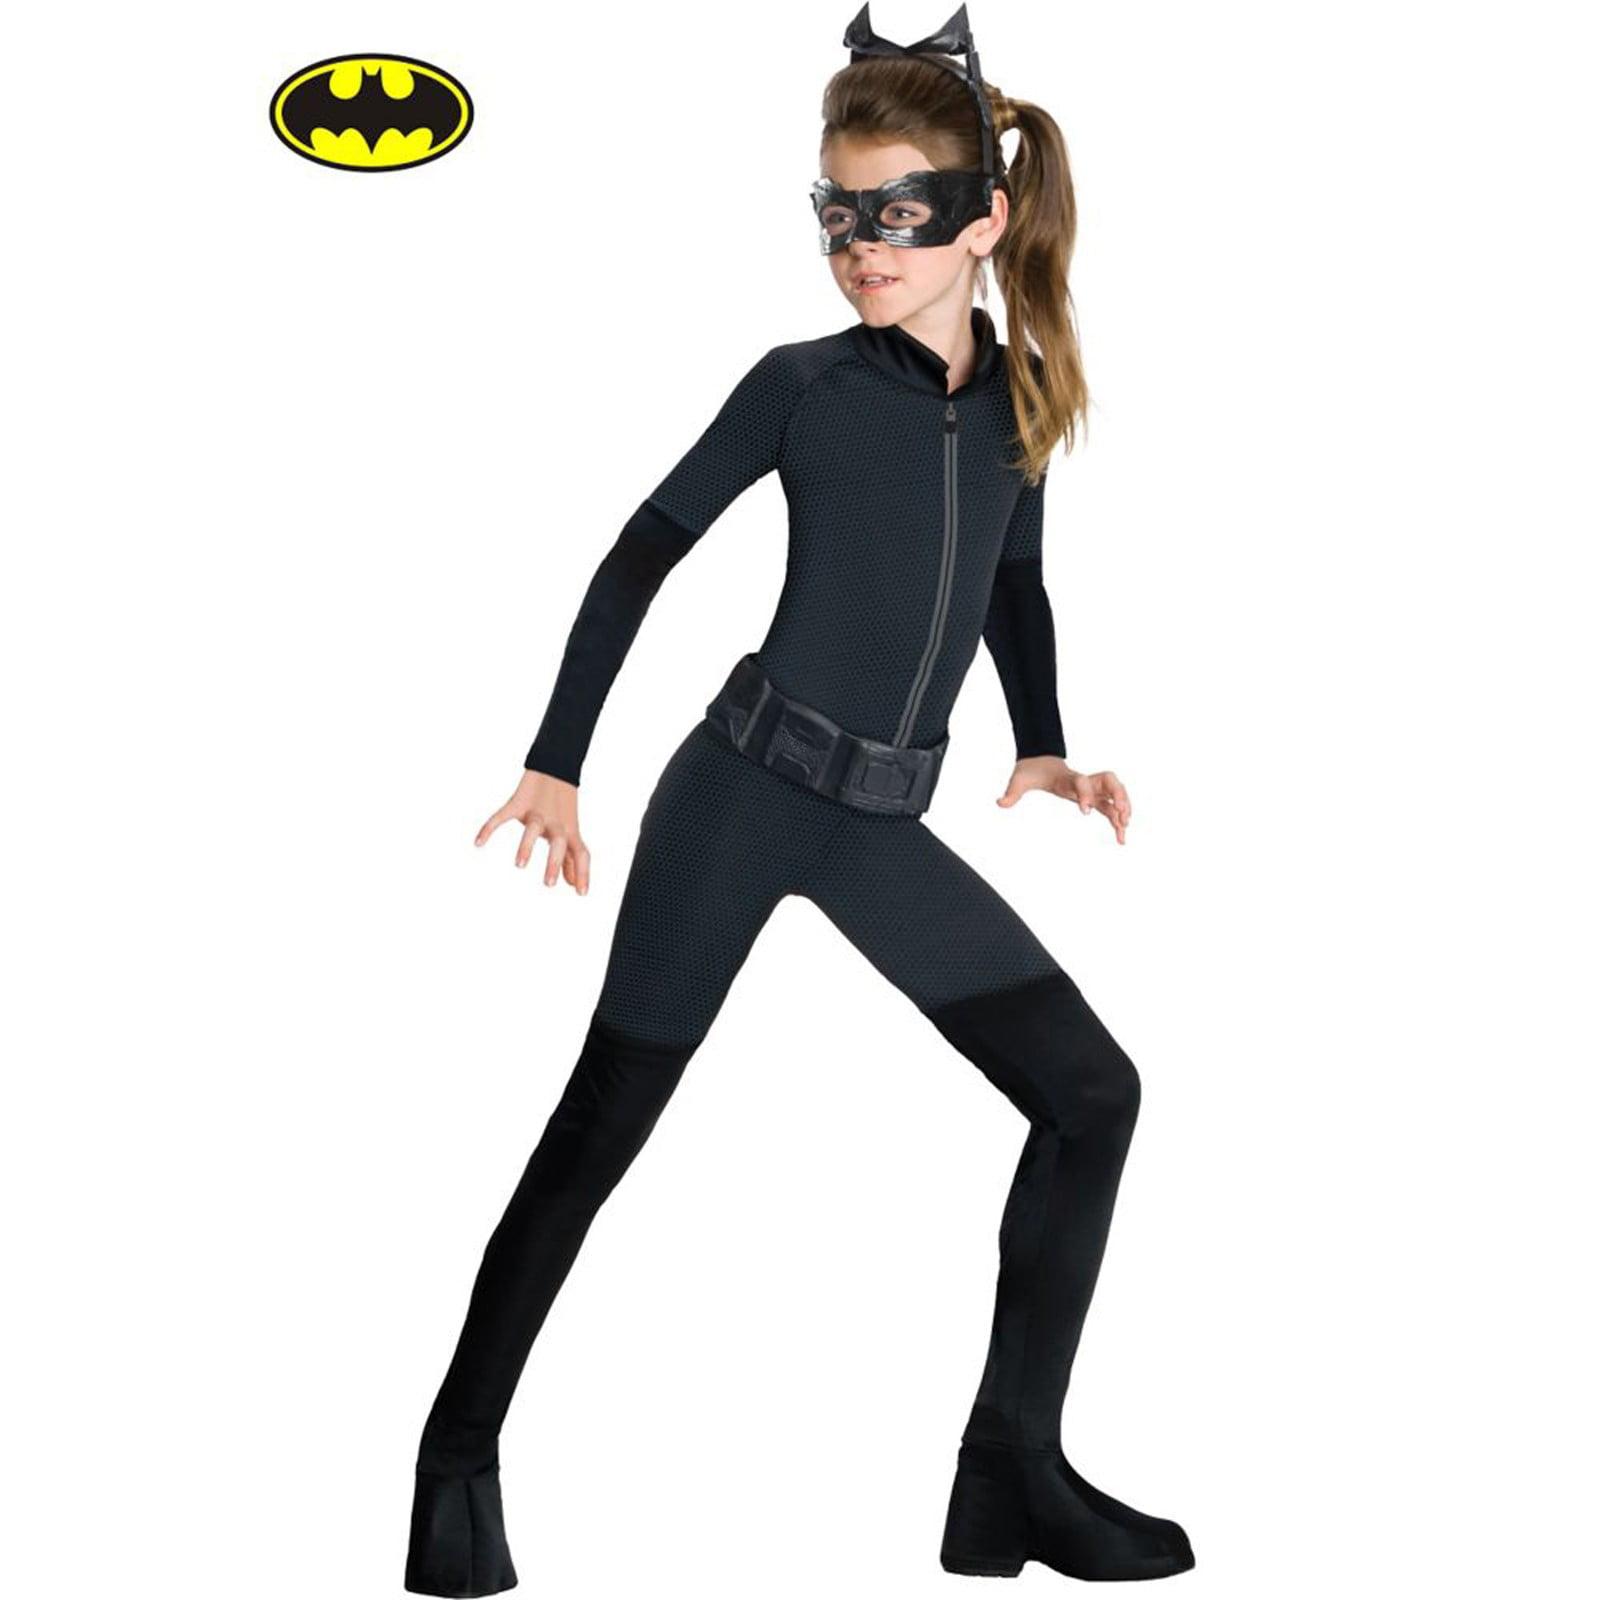 Batman the Dark Knight Catwomen Child Costume by Rubies